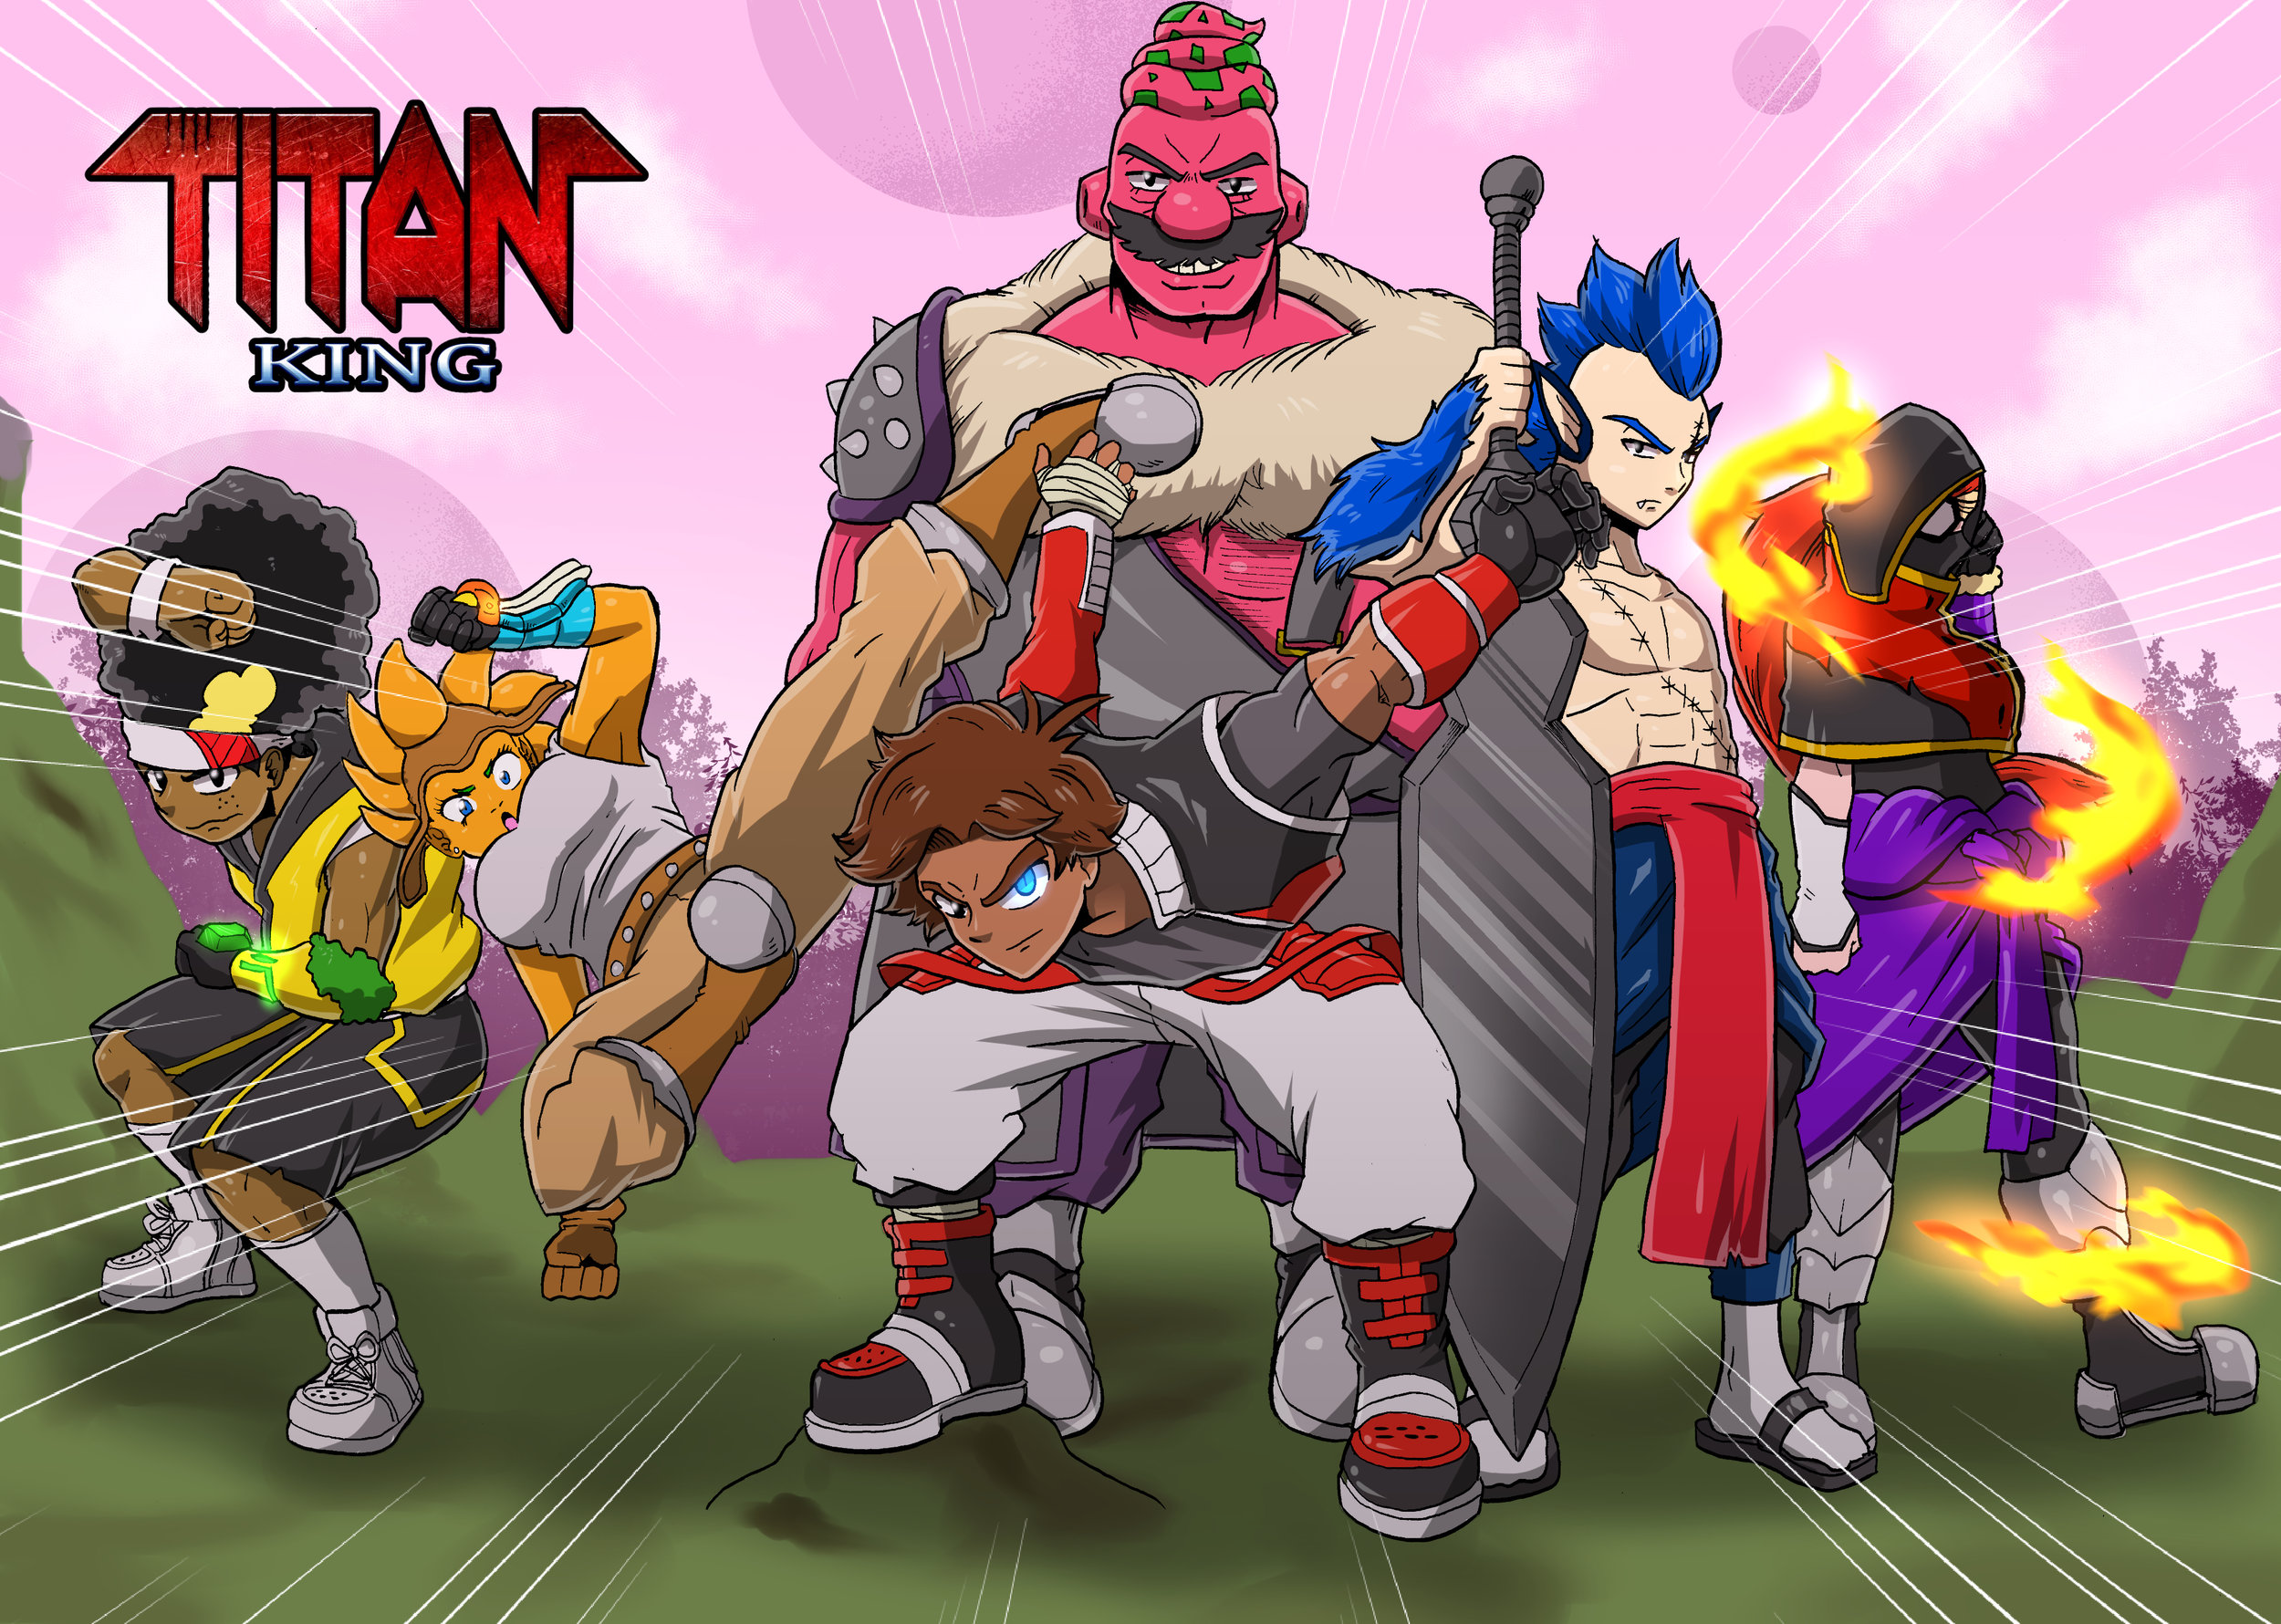 TITAN KING is a 1980's influenced EXCLUSIVE shonen manga by Tony Dawkins